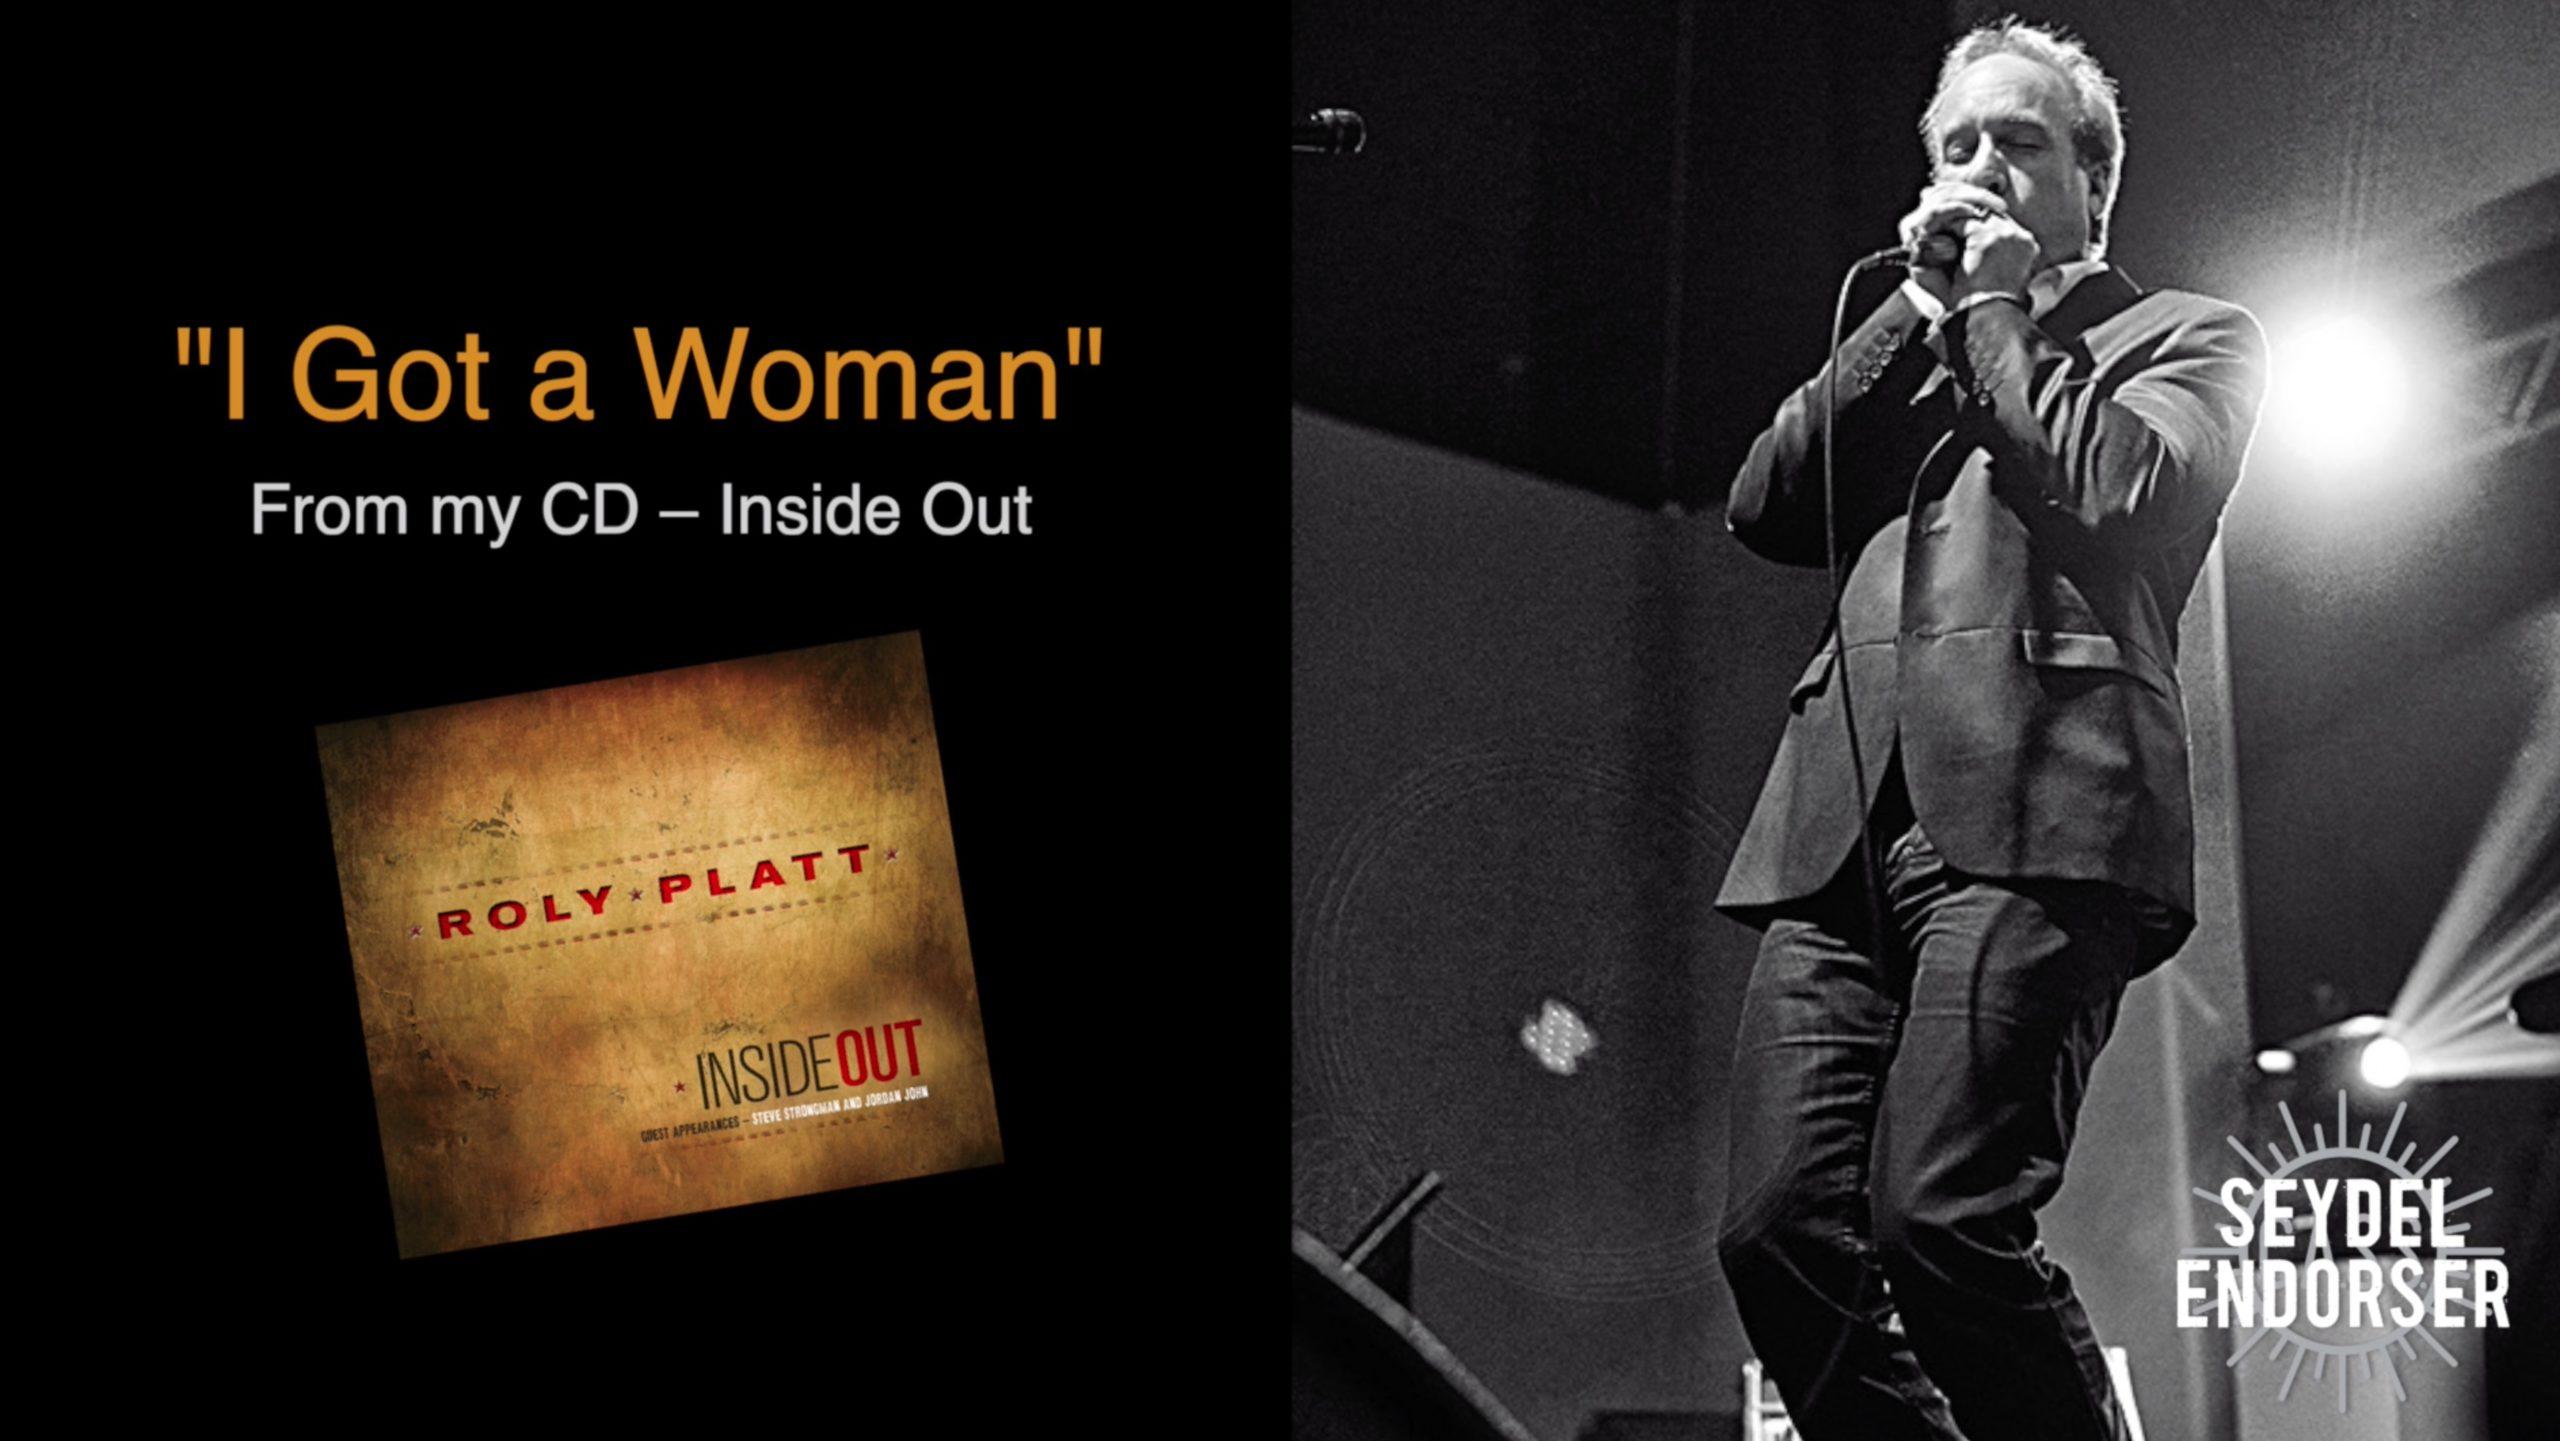 I Got a Woman (CD version)